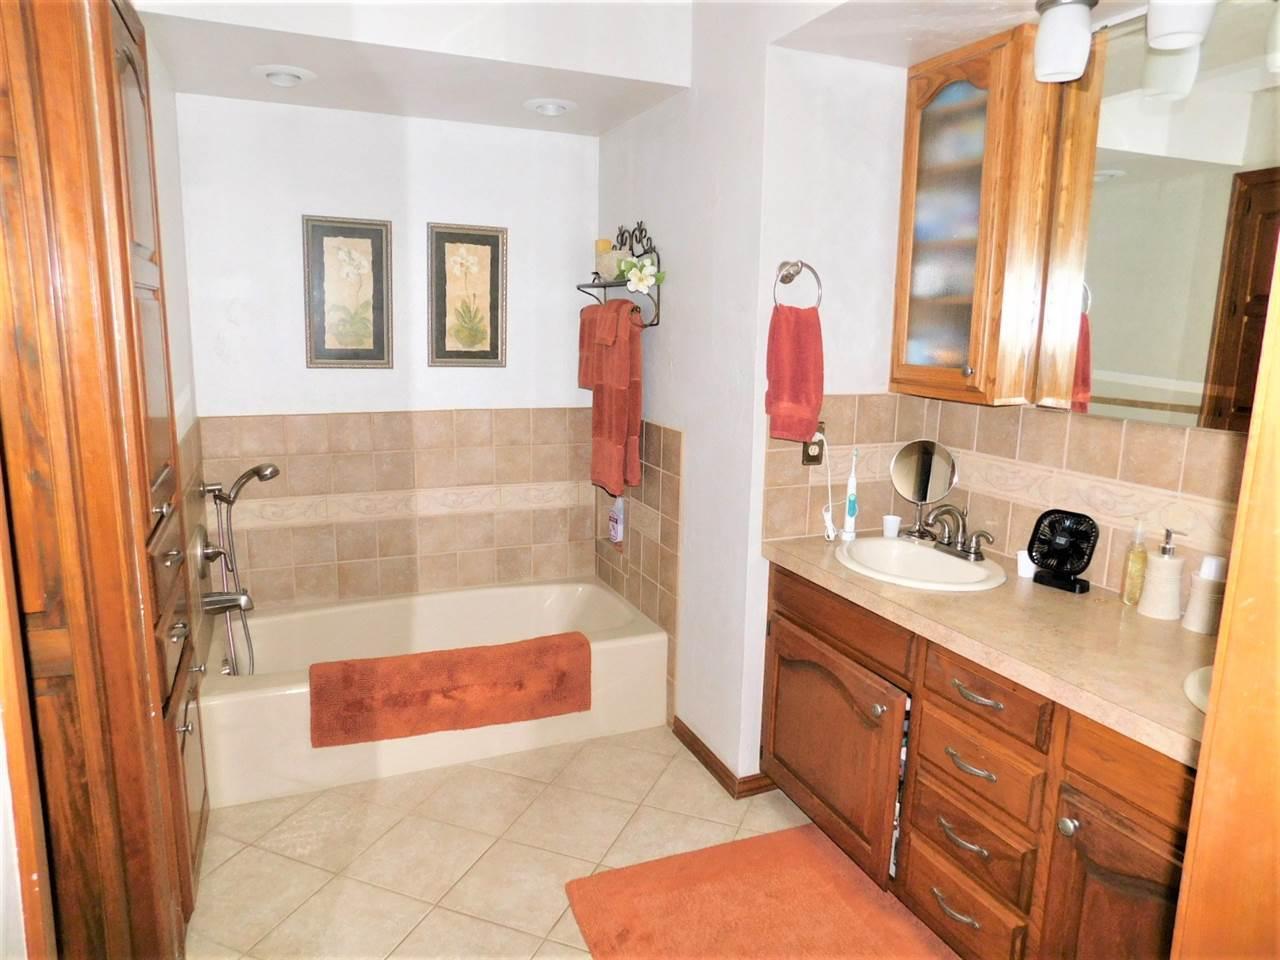 Sold Intraoffice W/MLS | 279 Braden School Rd.  Ponca City, OK 74604 13